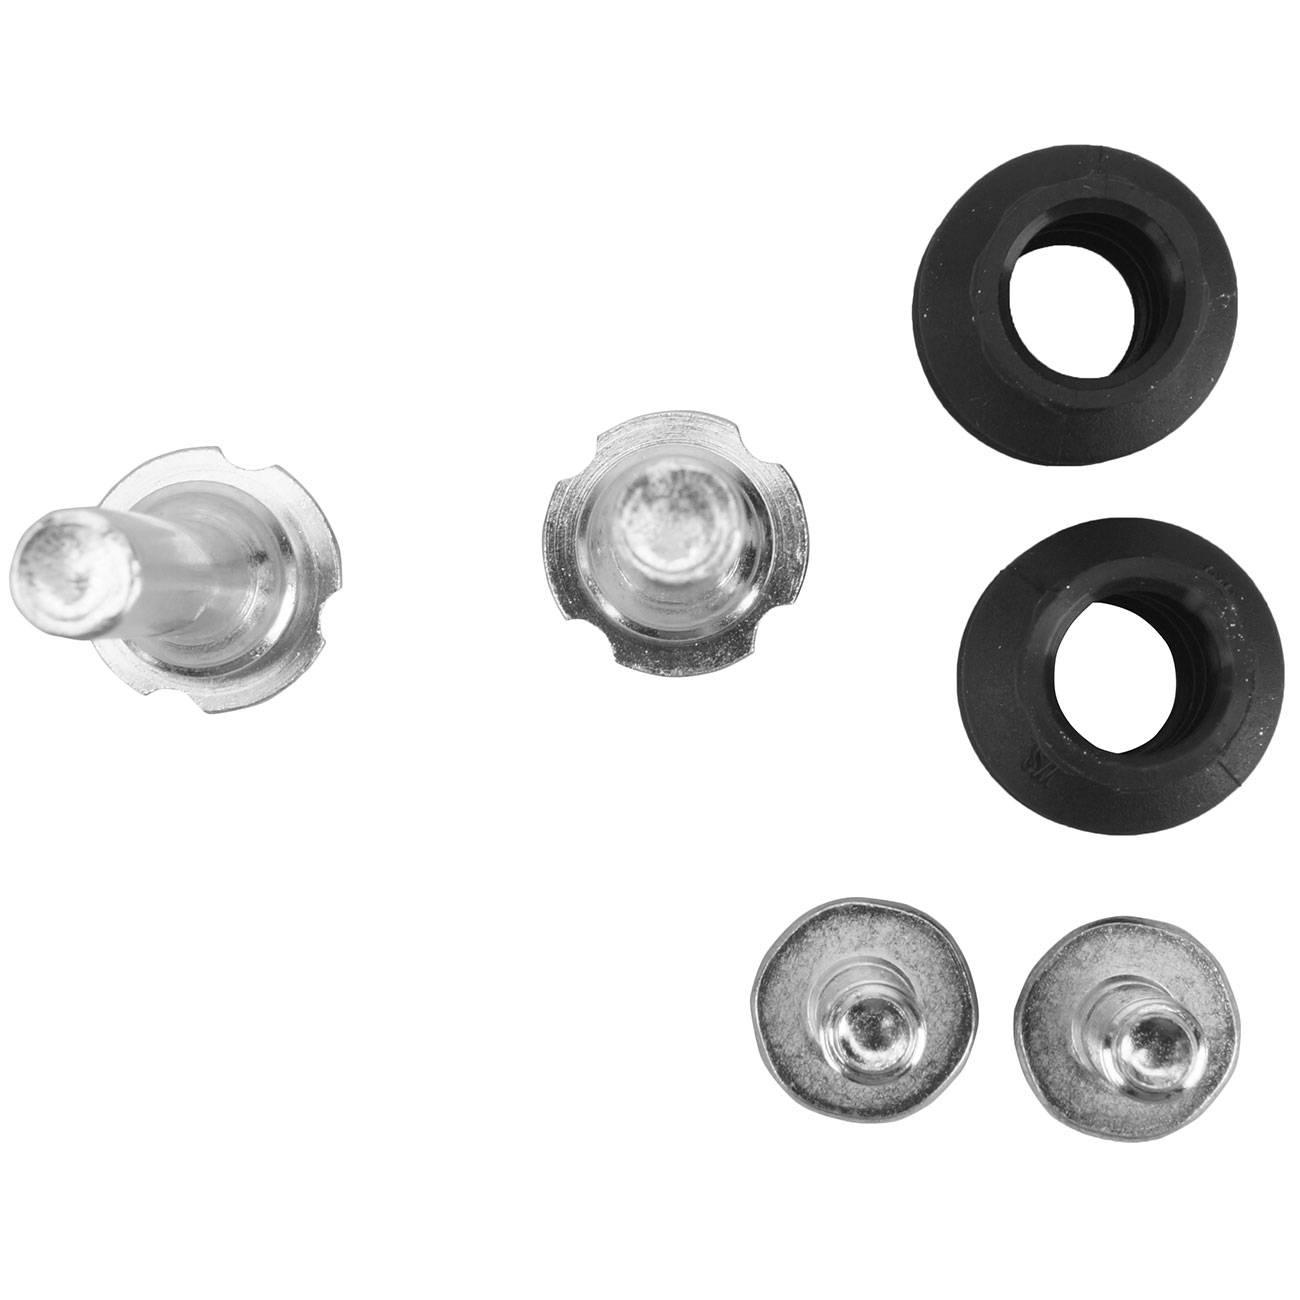 Bapmic-Set-Rear-Left-Brake-Caliper-Brake-System-for-BMW-114i-116i-125i-420i thumbnail 6